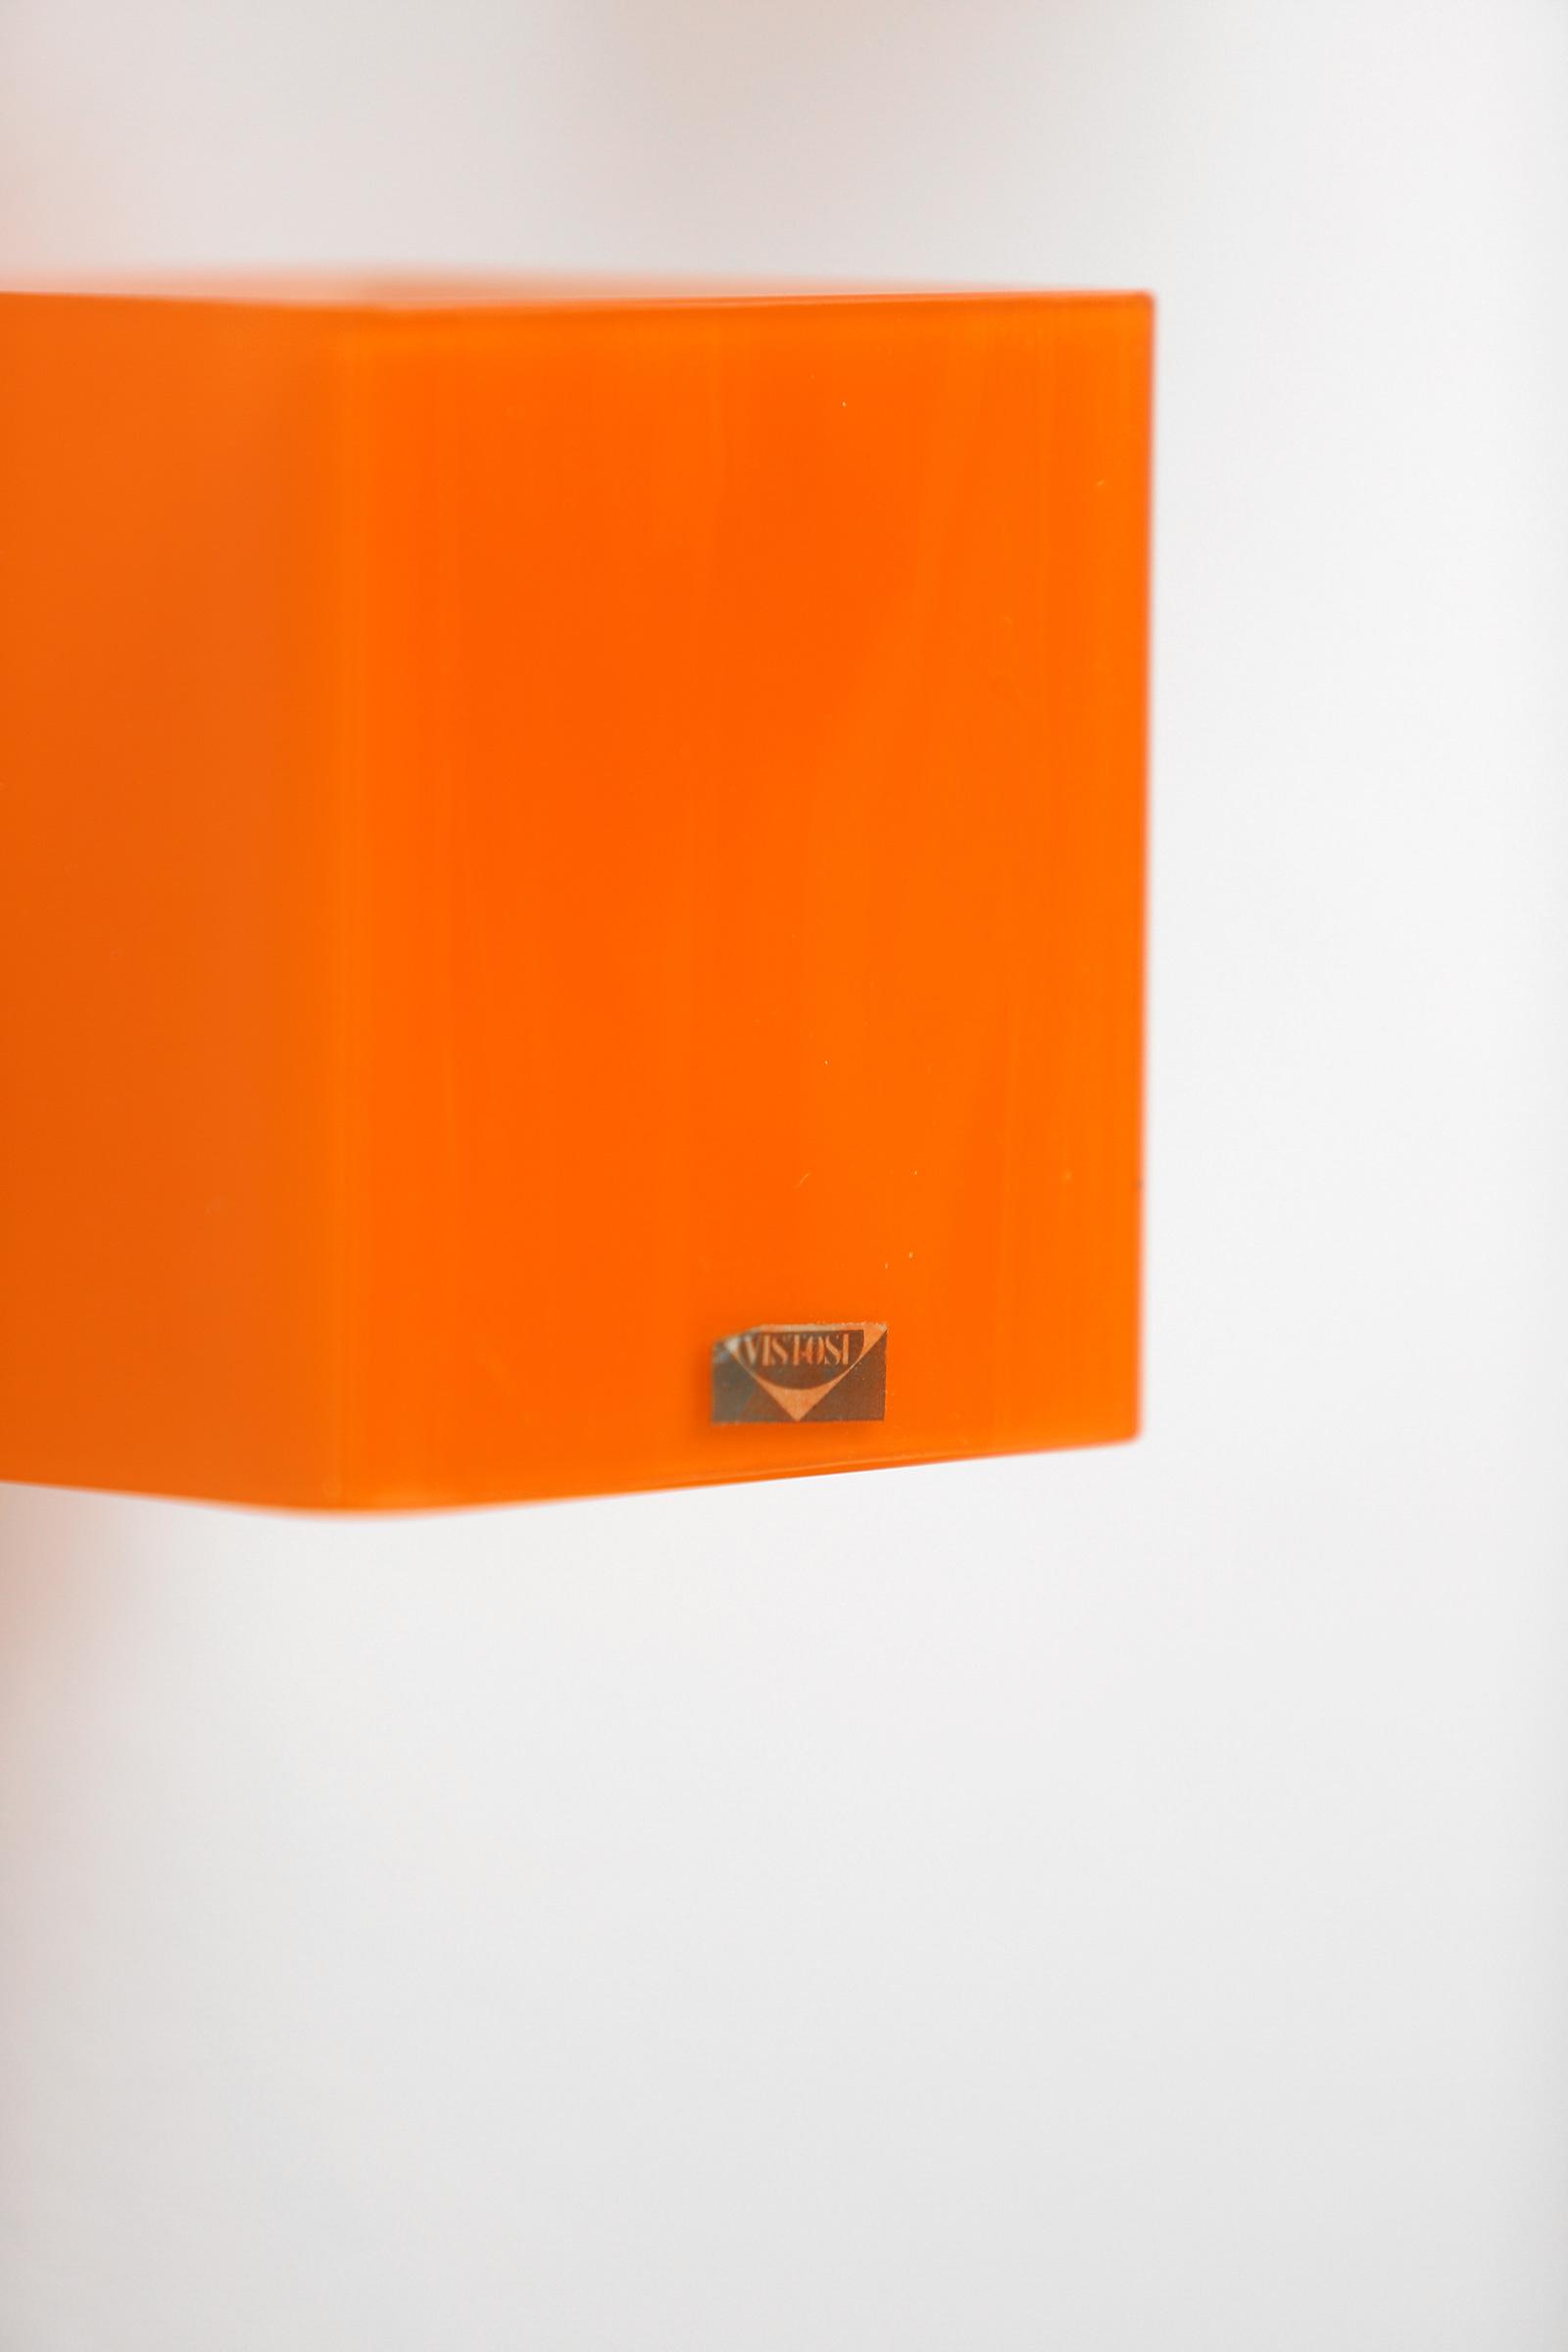 Pair of vistosi orange wall sconces 1963image 10